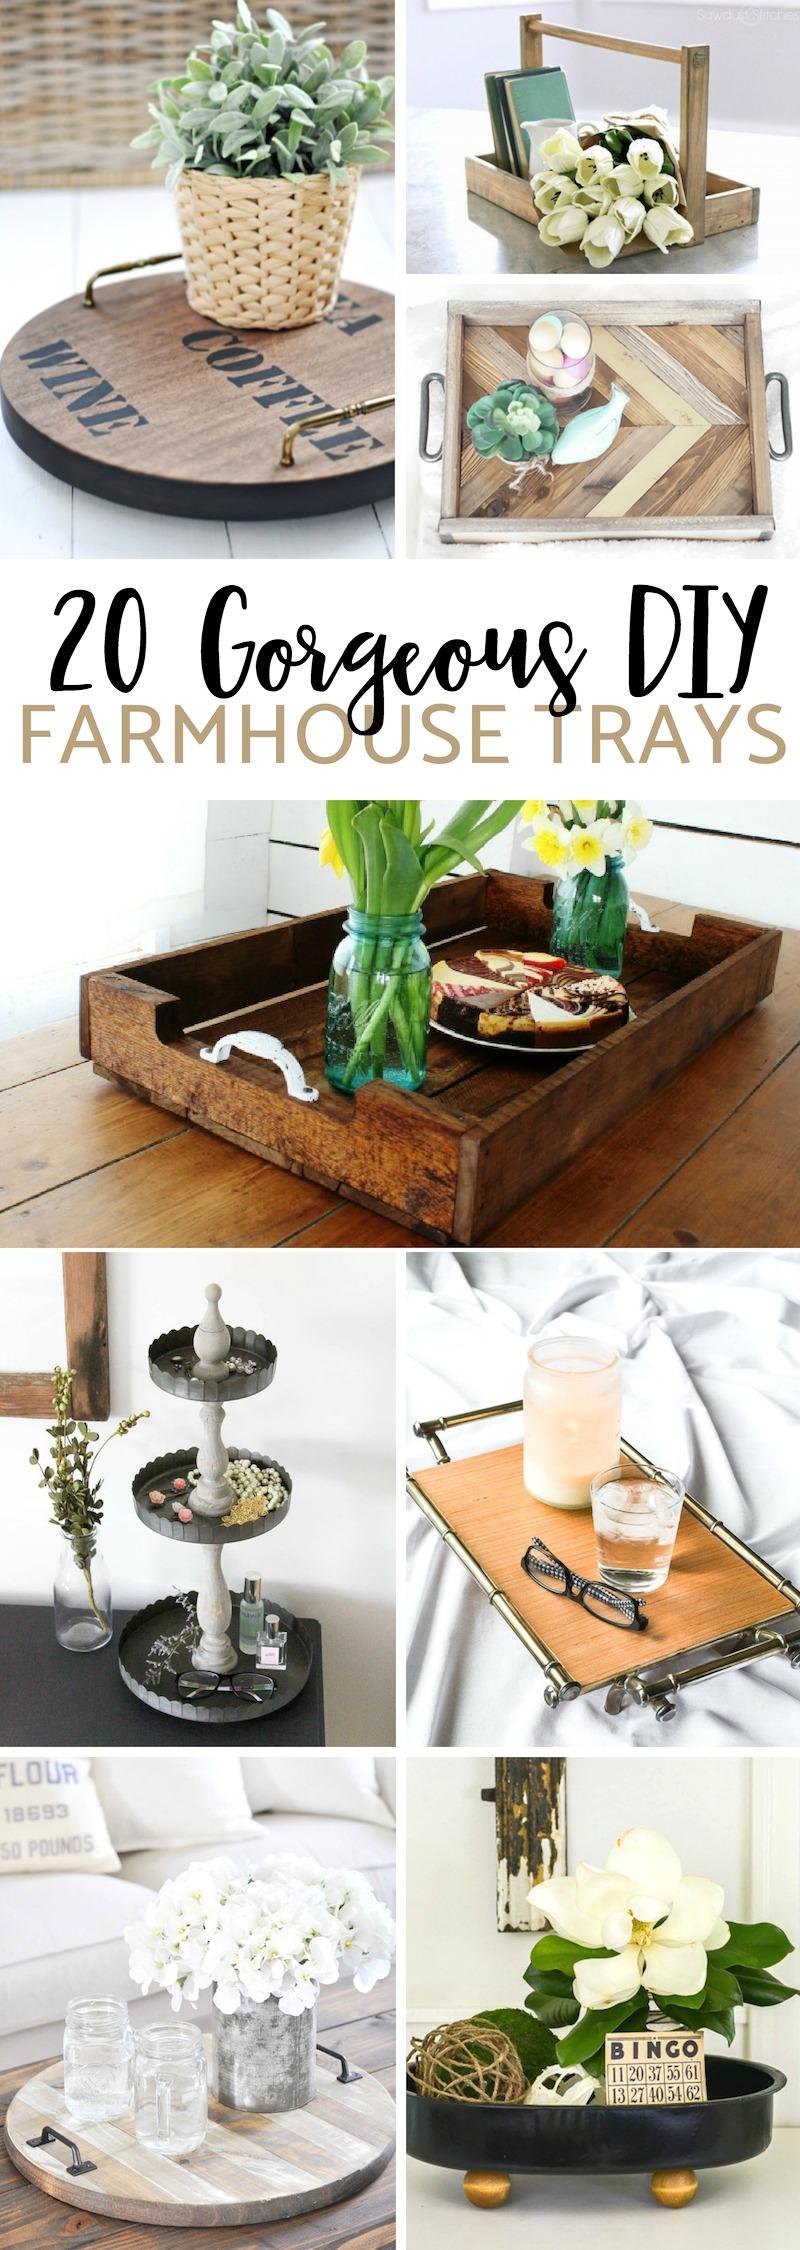 DIY Farmhouse Trays